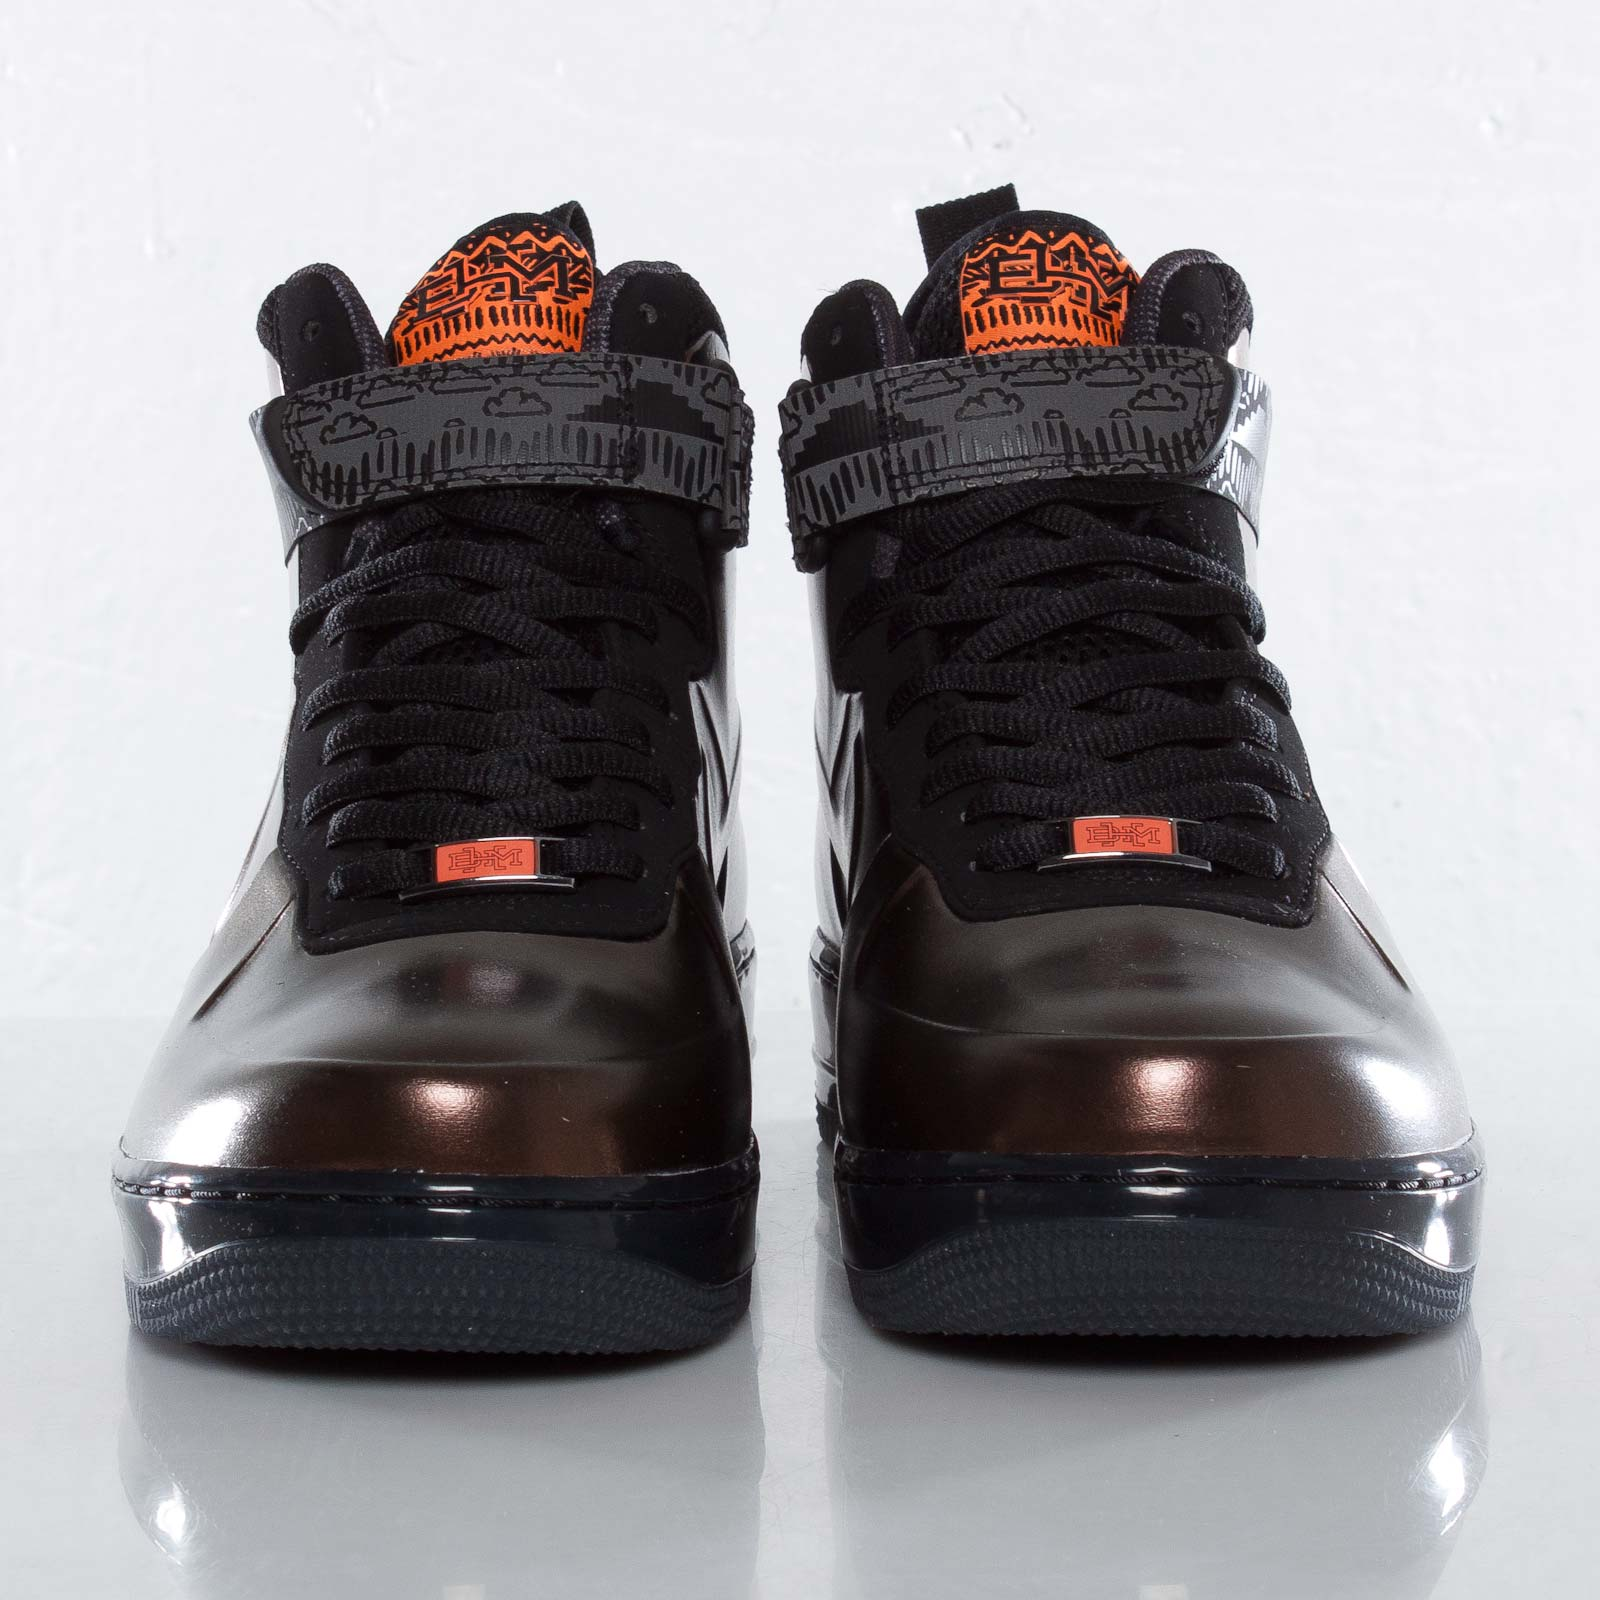 reputable site d939a 61a66 Nike Air Force 1 Foamposite BHM QS - 586583-800 - Sneakersnstuff   sneakers    streetwear online since 1999